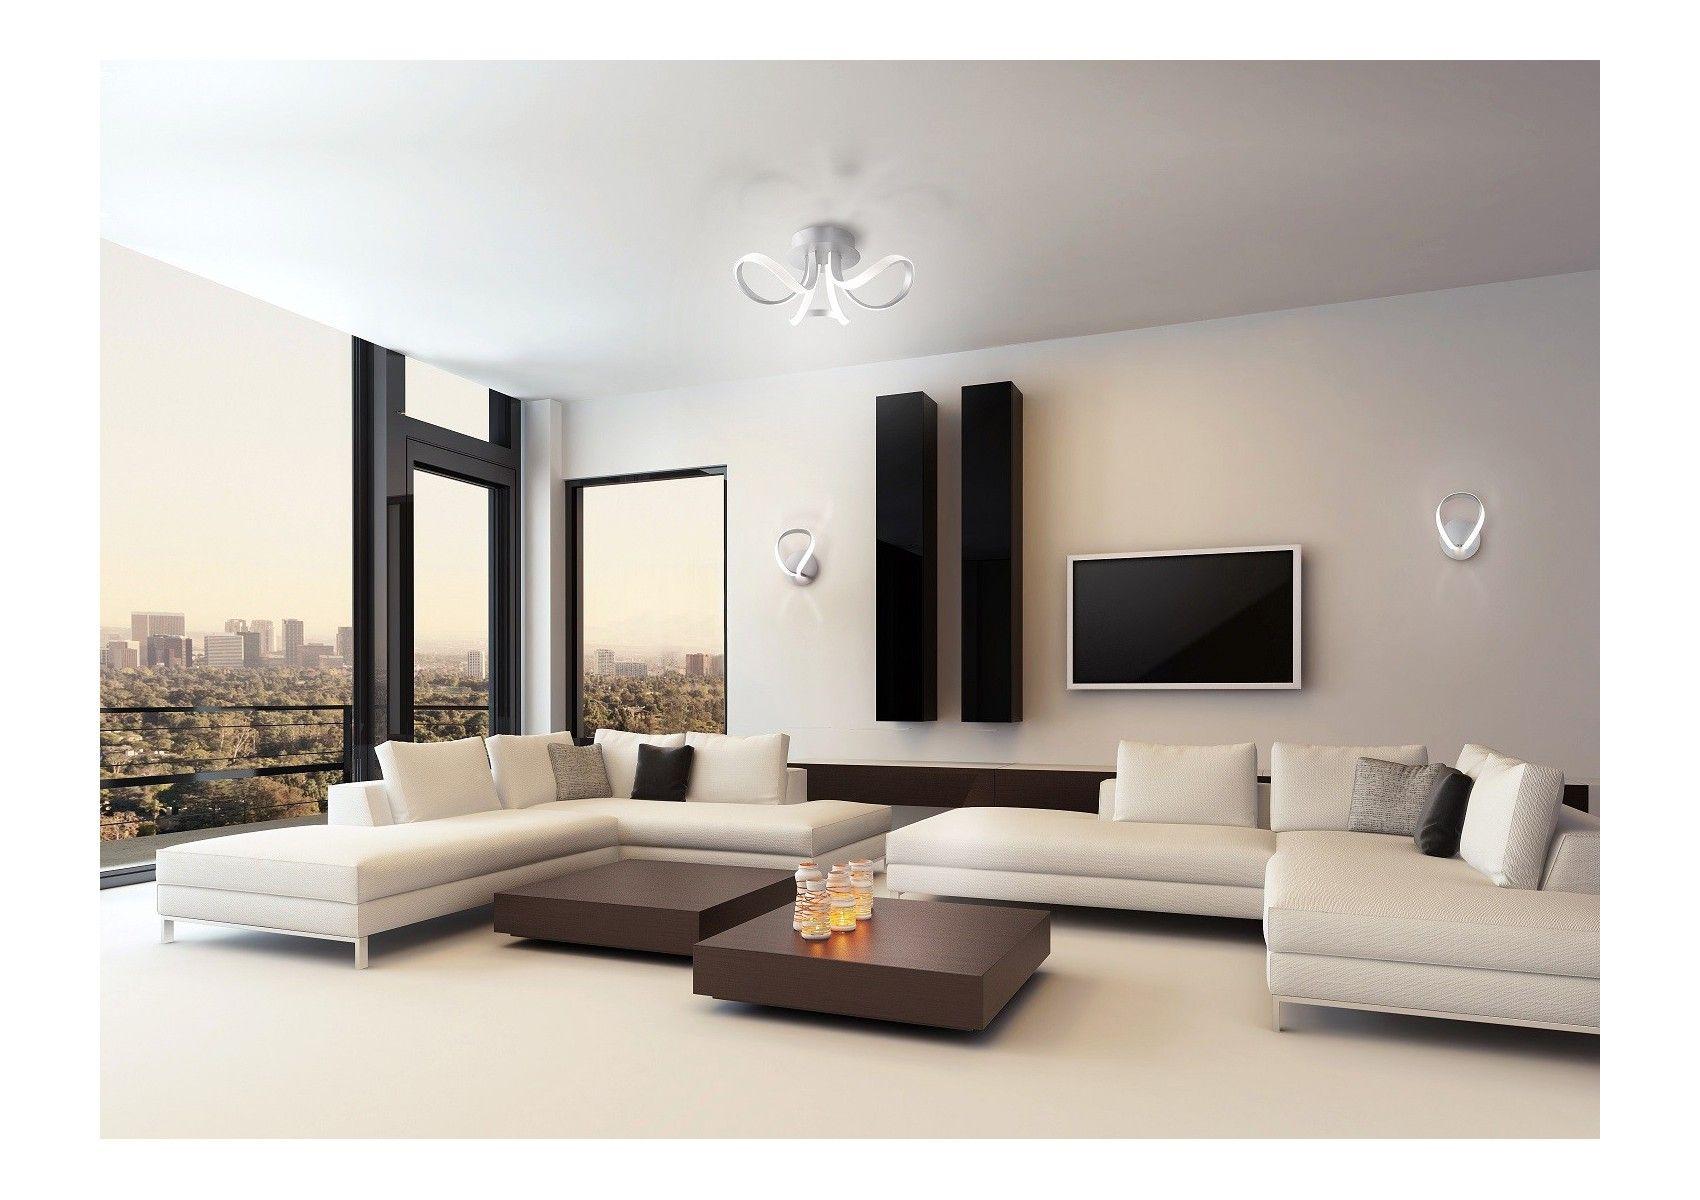 plafonnier design knot 3 lampes boite design. Black Bedroom Furniture Sets. Home Design Ideas